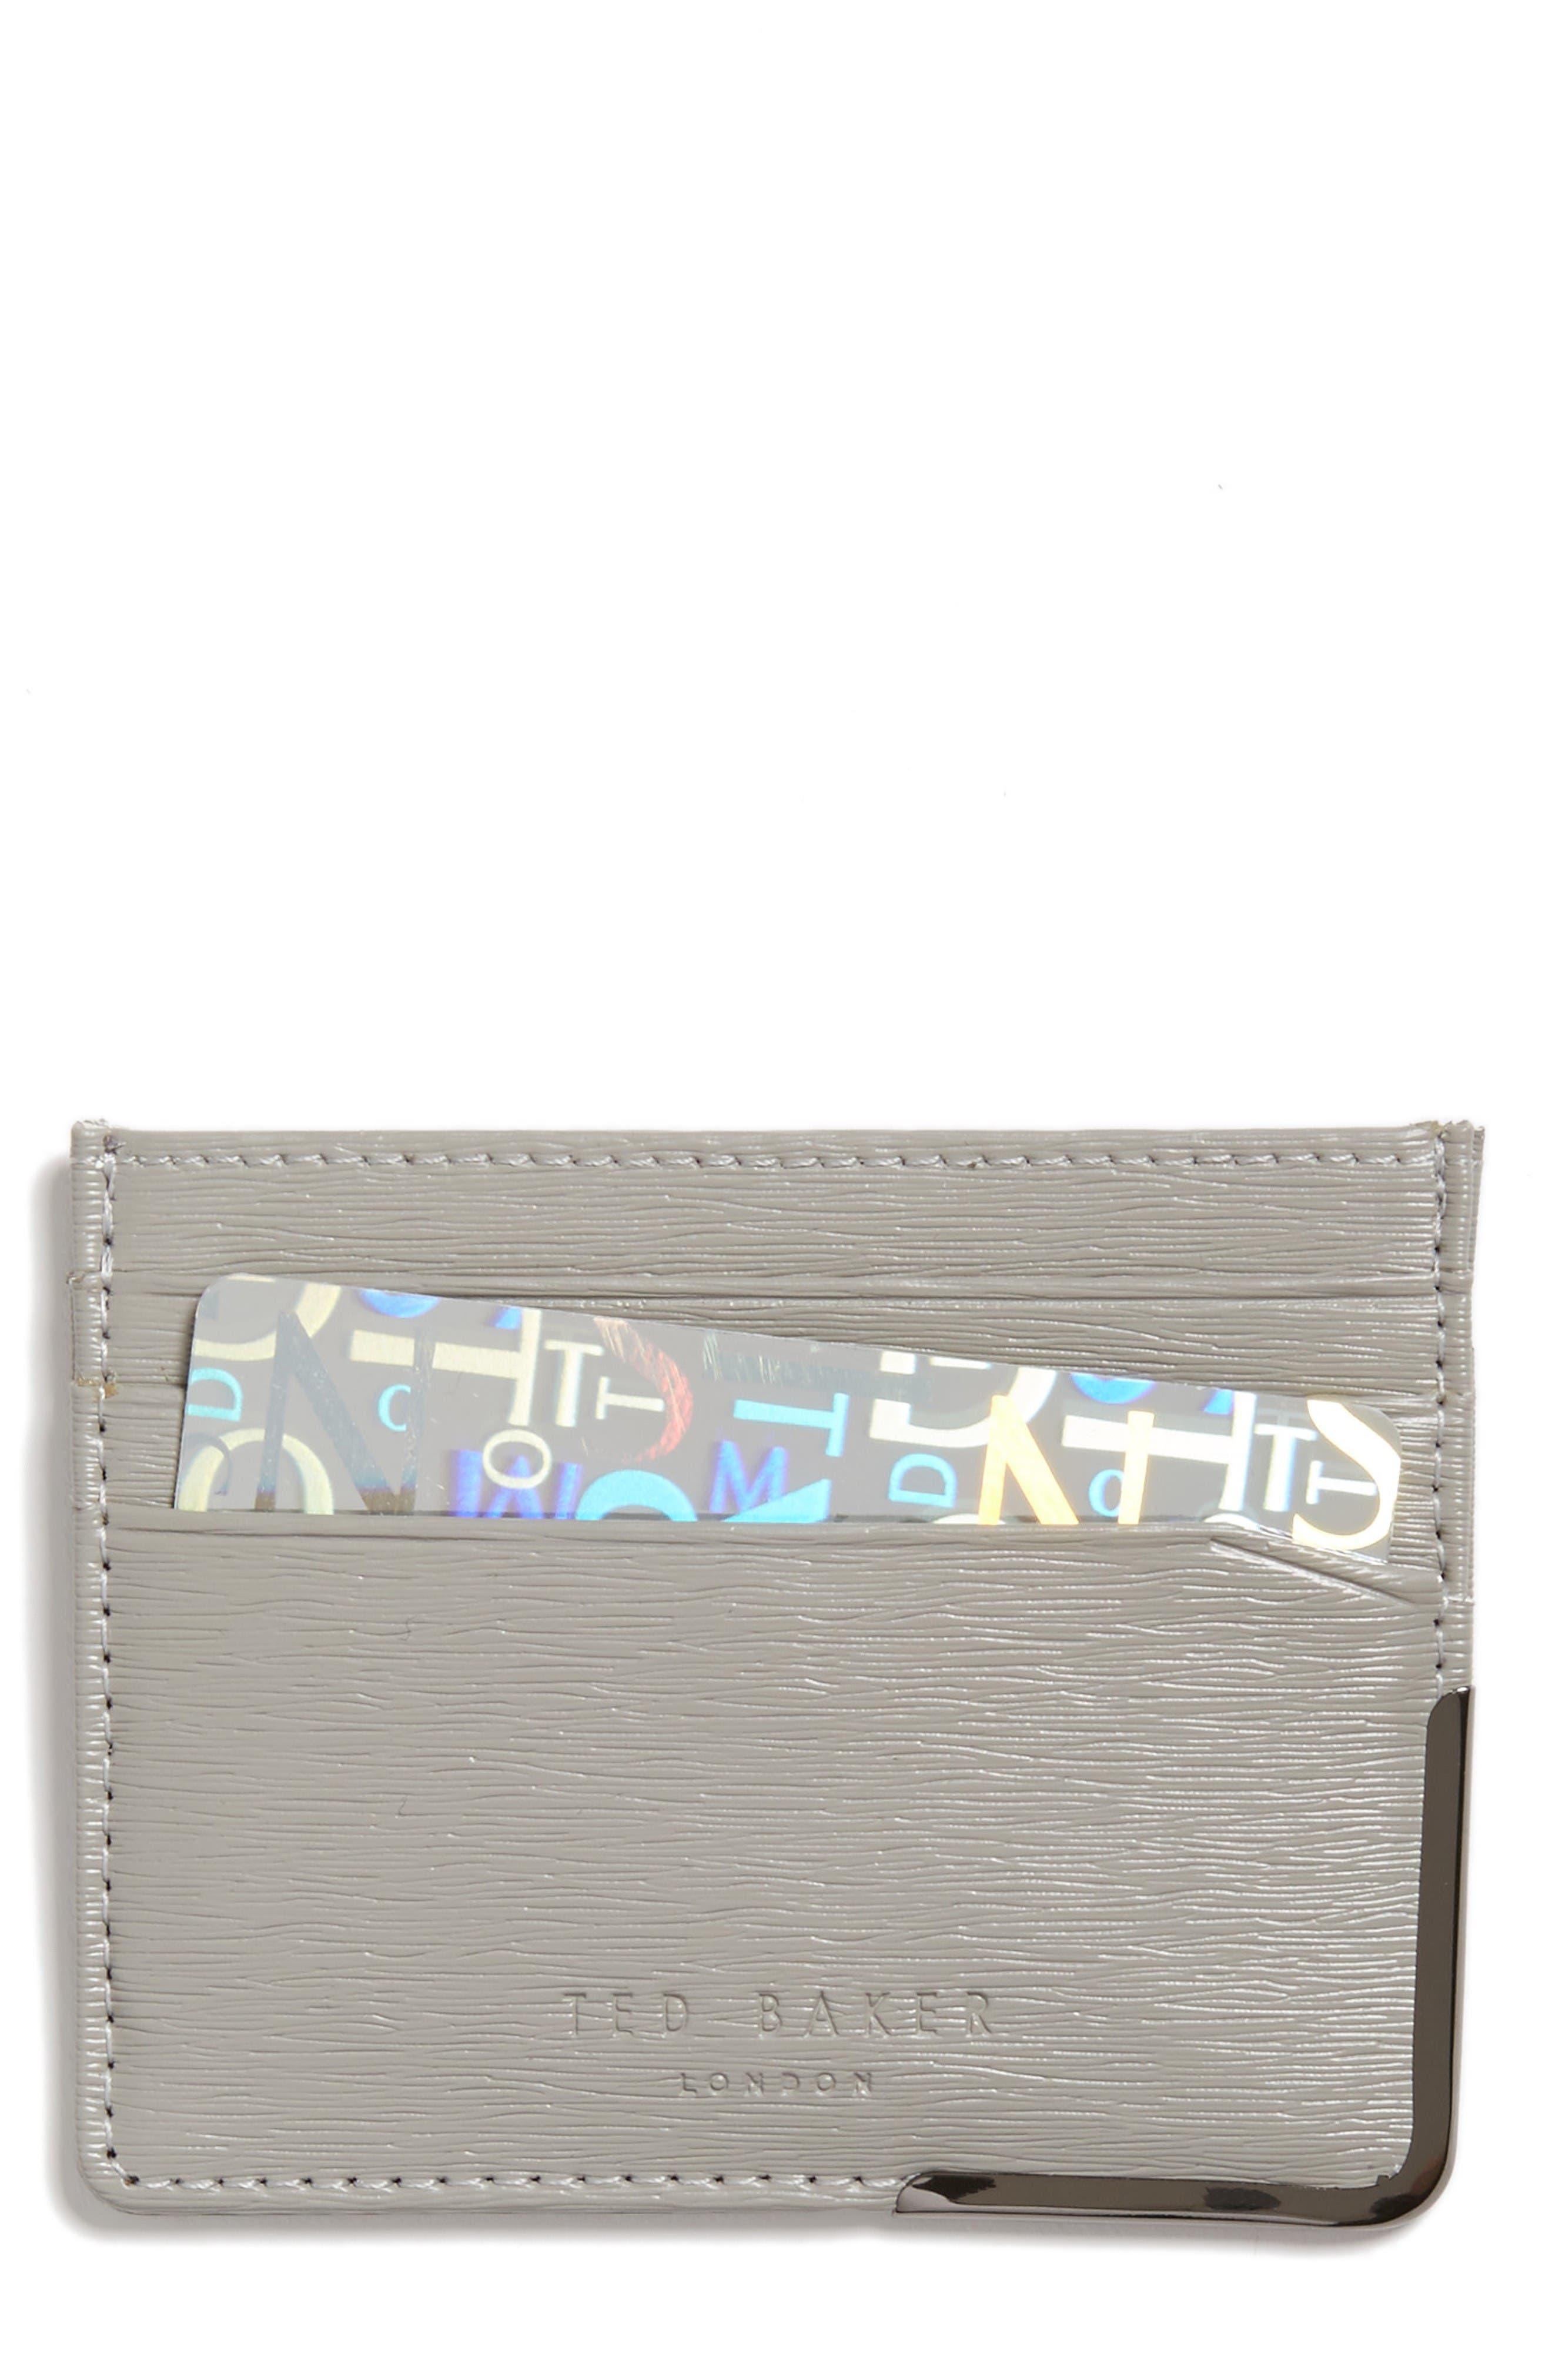 TED BAKER LONDON Foldcor Leather Card Case